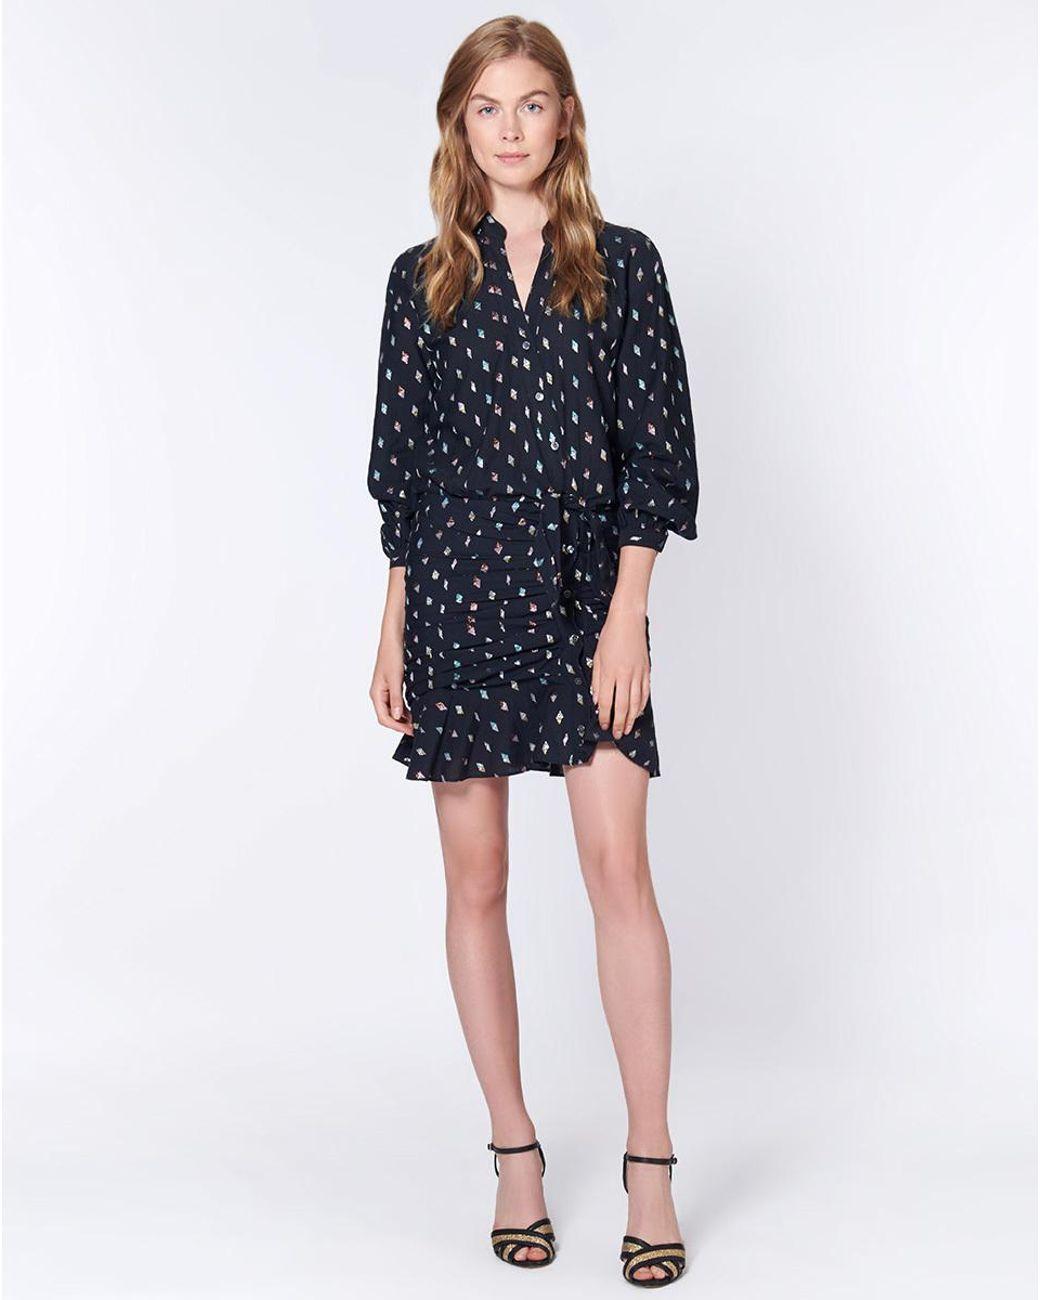 93bf25c036866 Veronica Beard Alia Dress in Black - Save 60% - Lyst